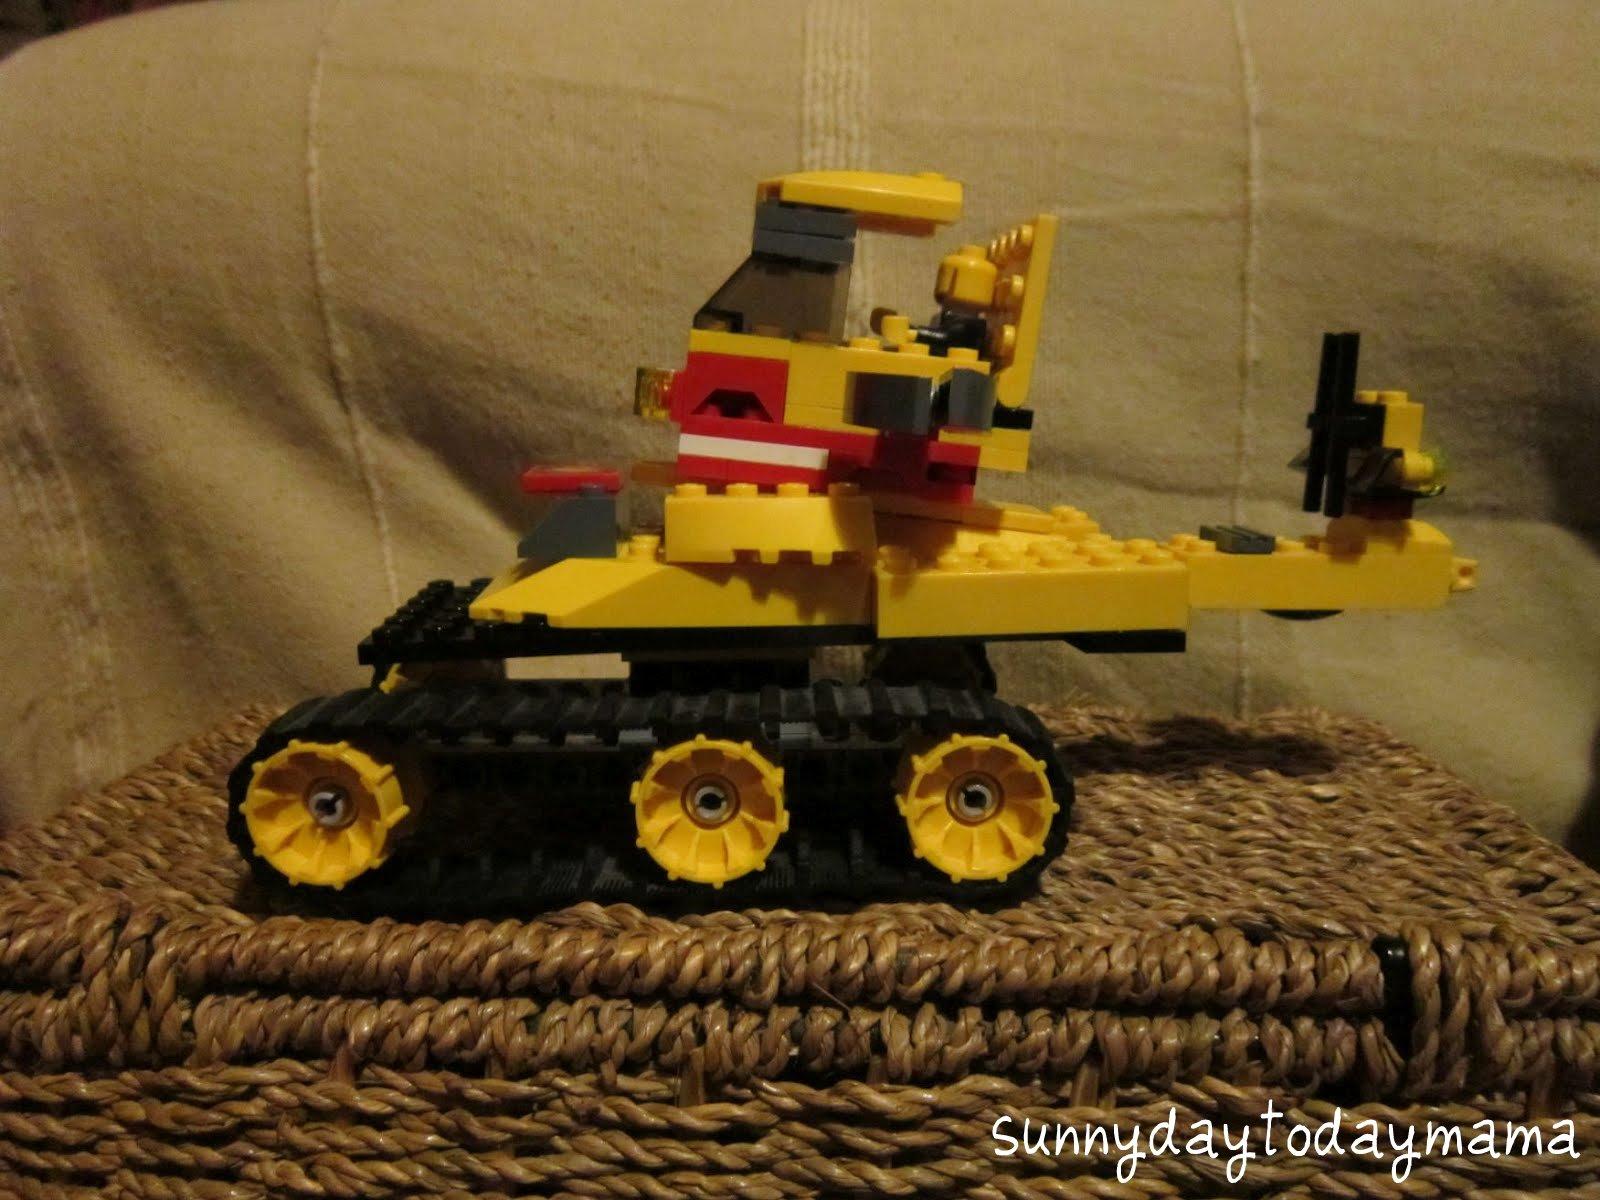 Sunnydaytodaymama Lego Inspiration